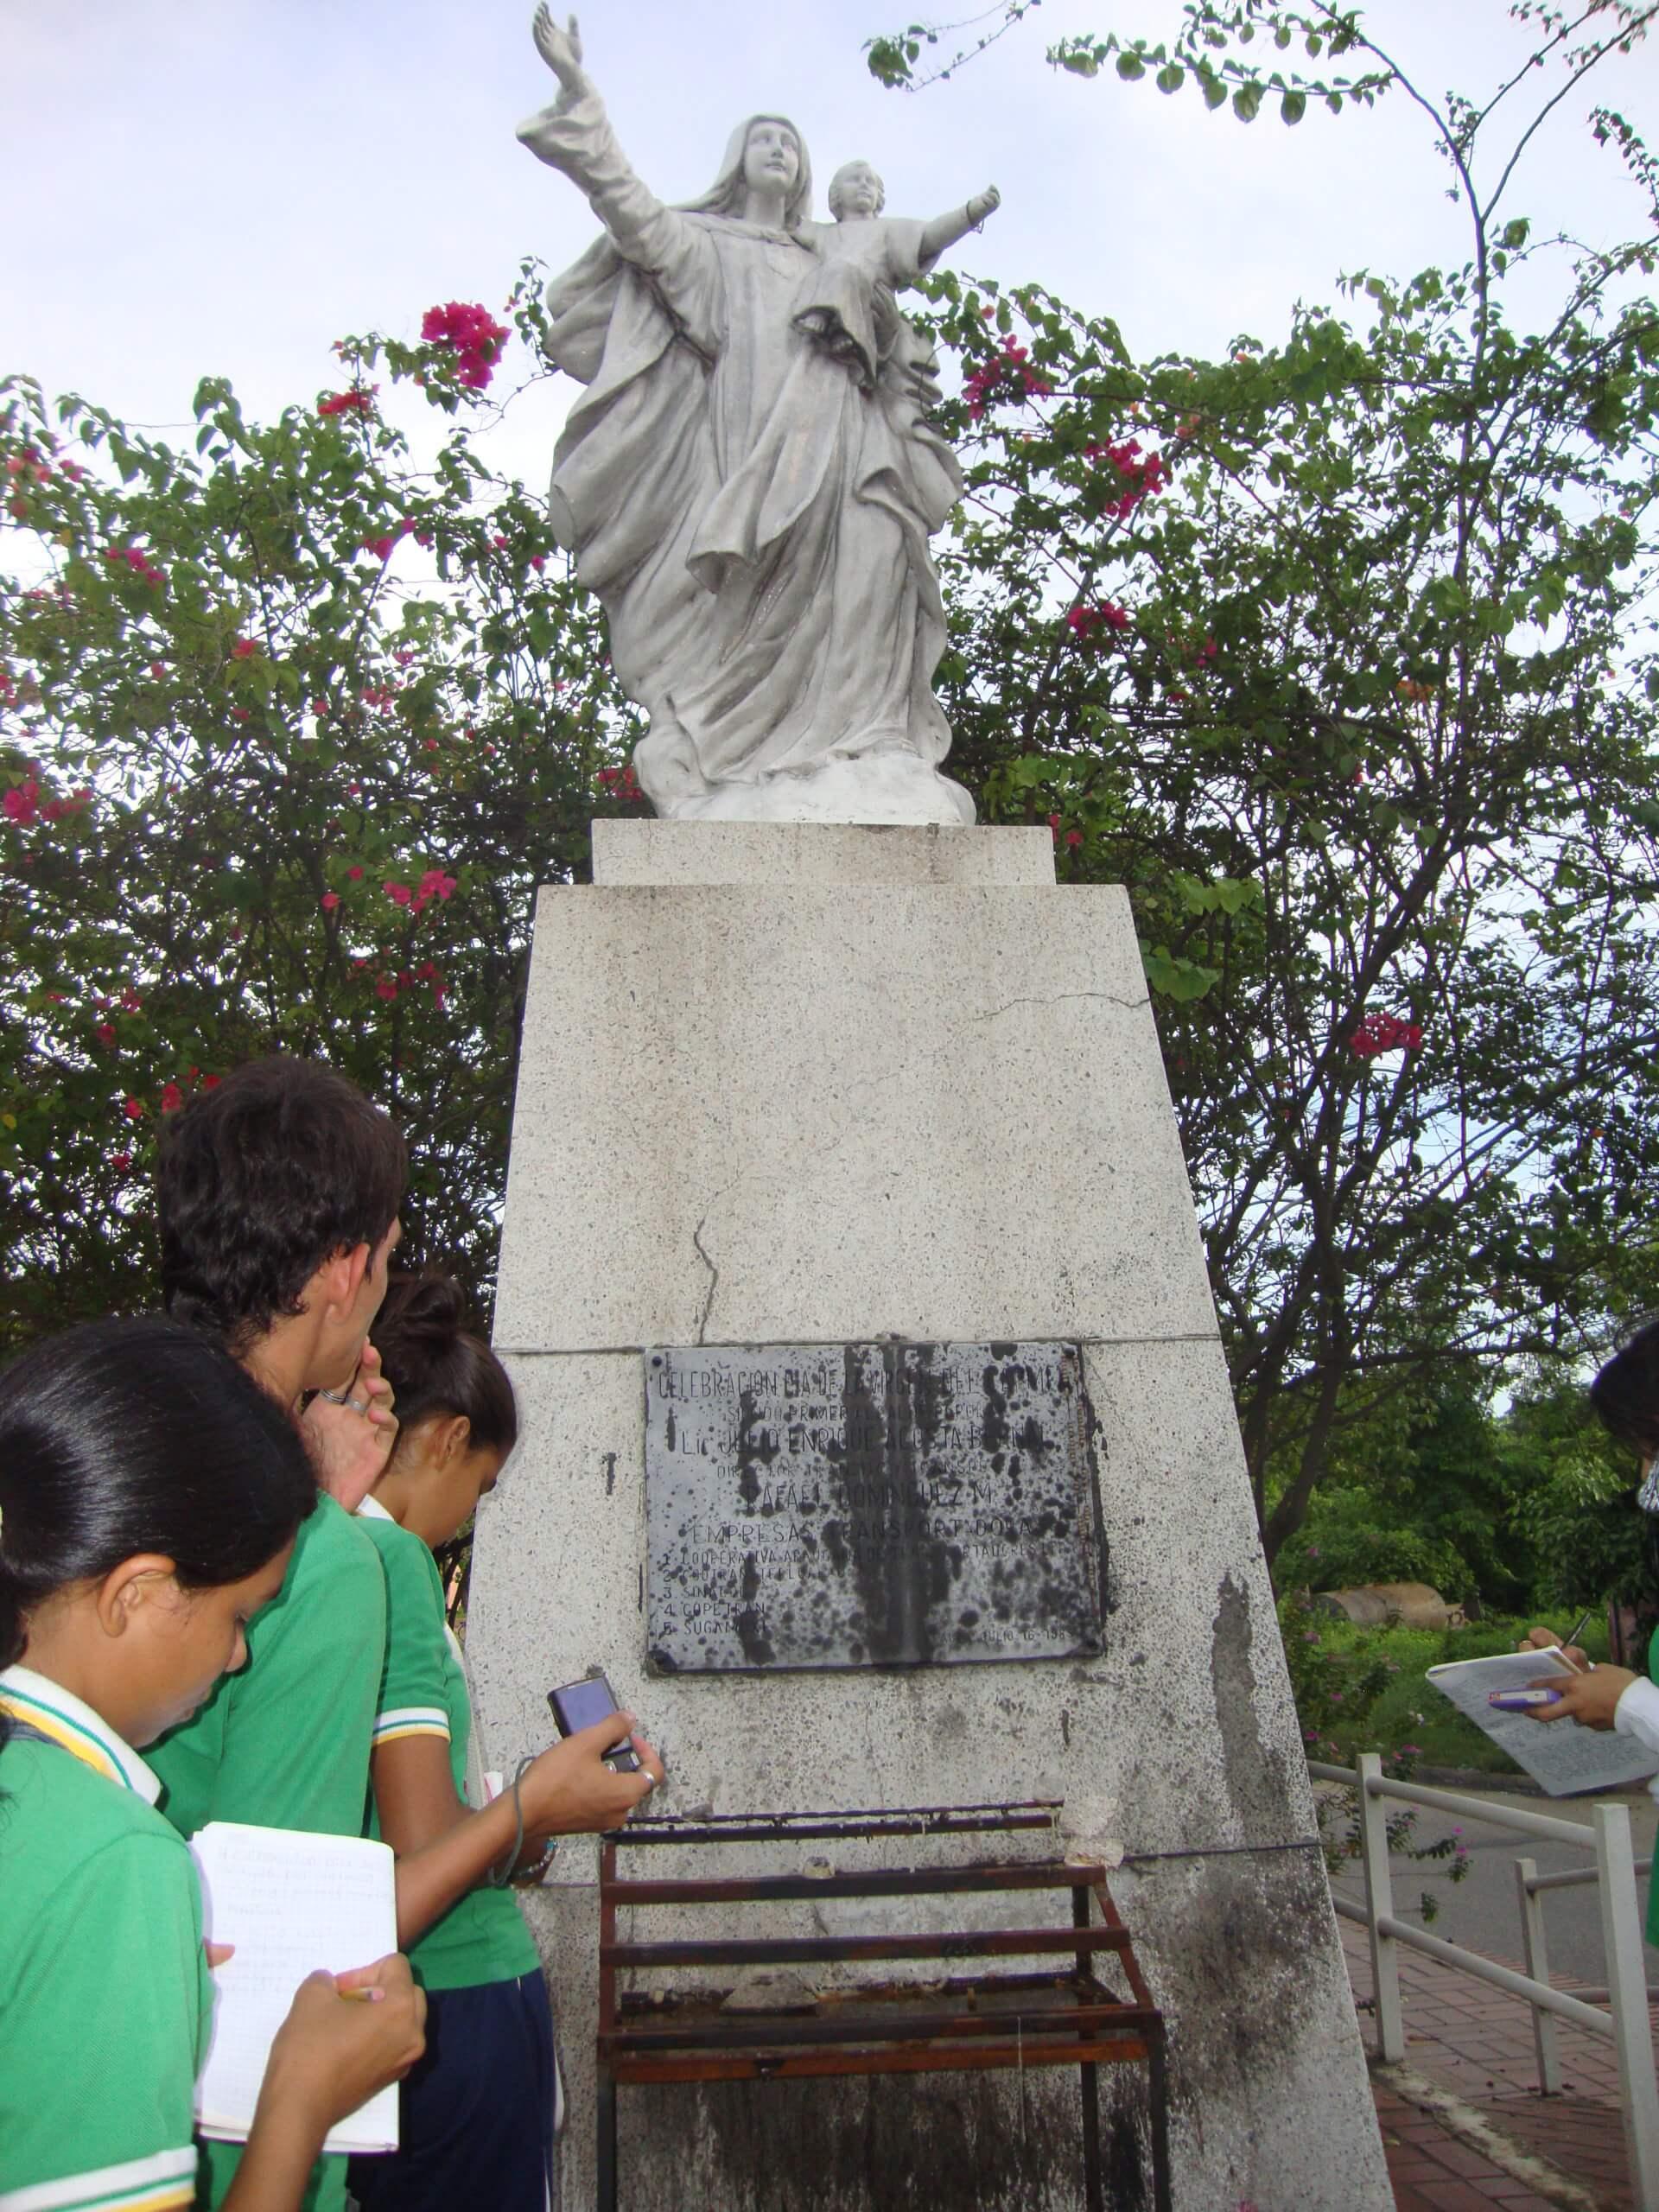 Alcalde Tovar se reunió con obispo de la Diócesis de Arauca. Se realizarán jornadas de embellecimiento a monumentos religiosos.